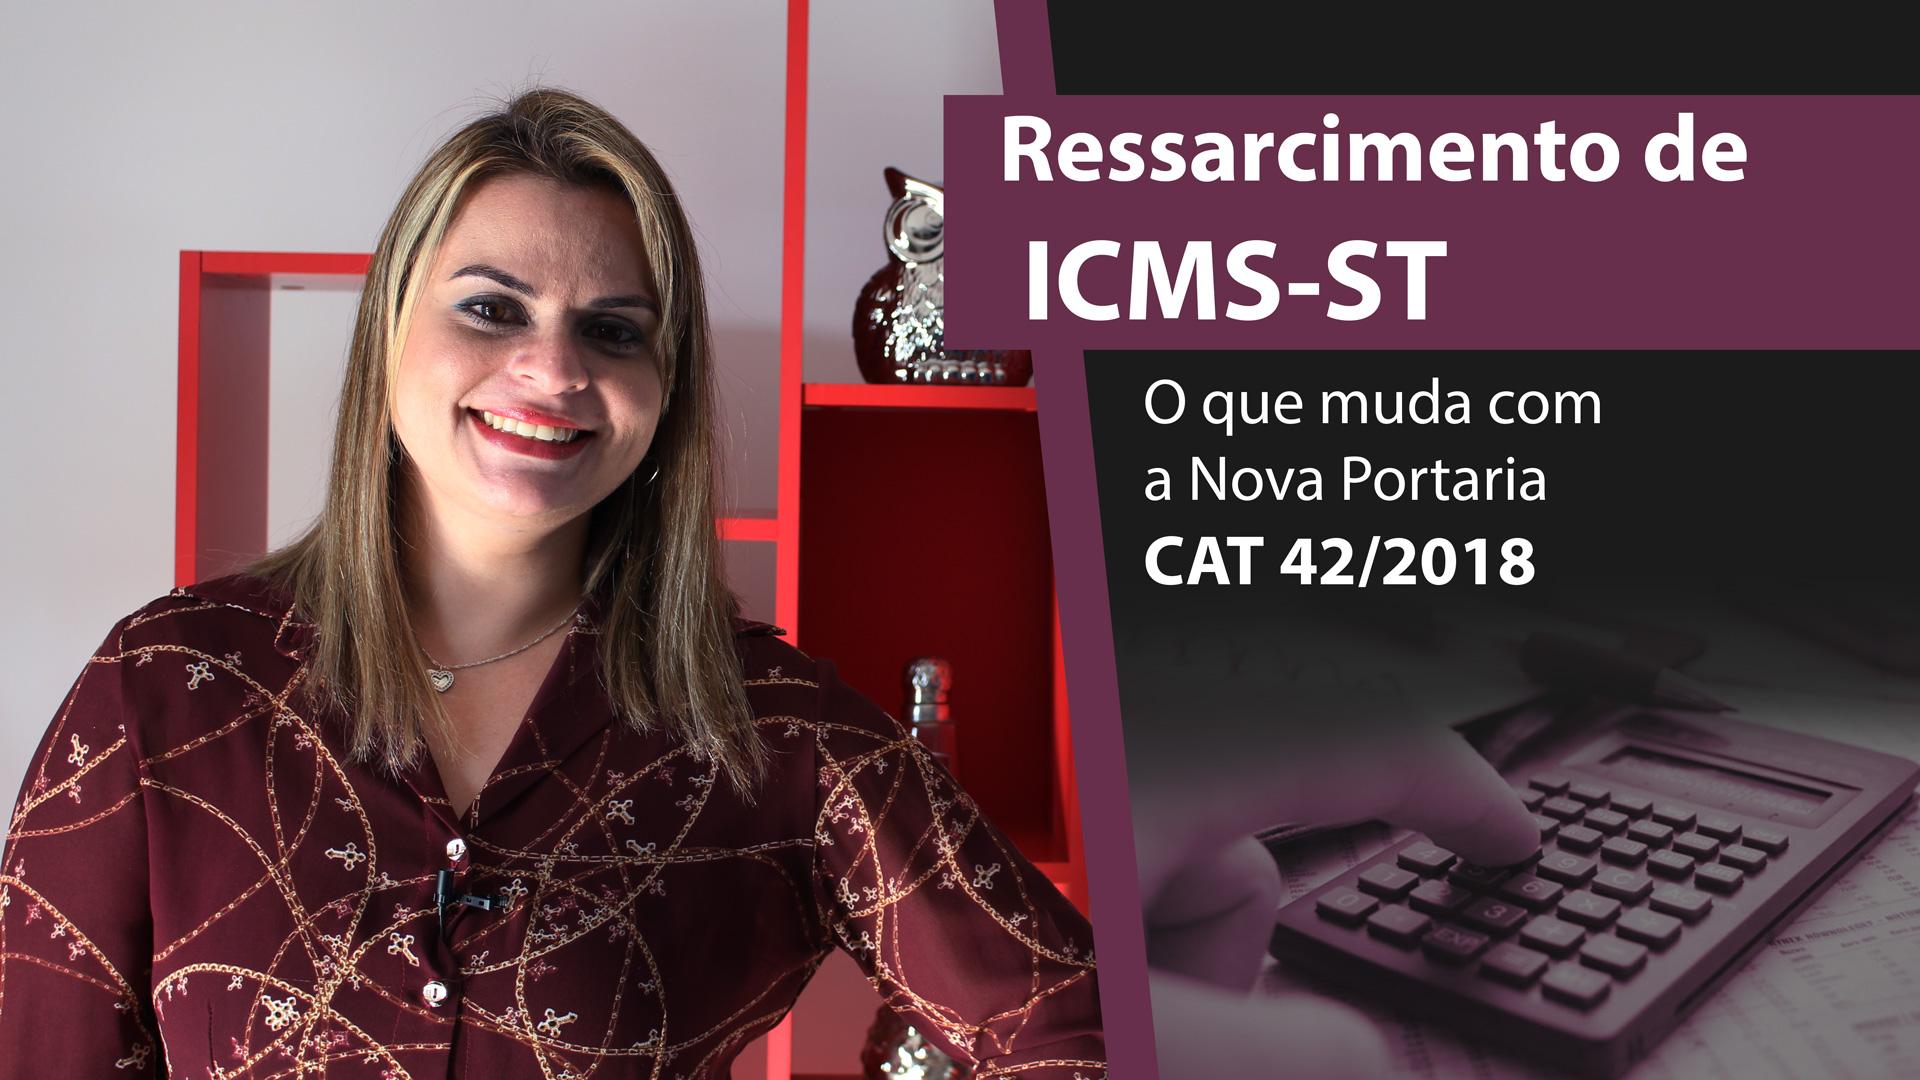 Palestra Gratuita | Ressarcimento De ICMS-ST